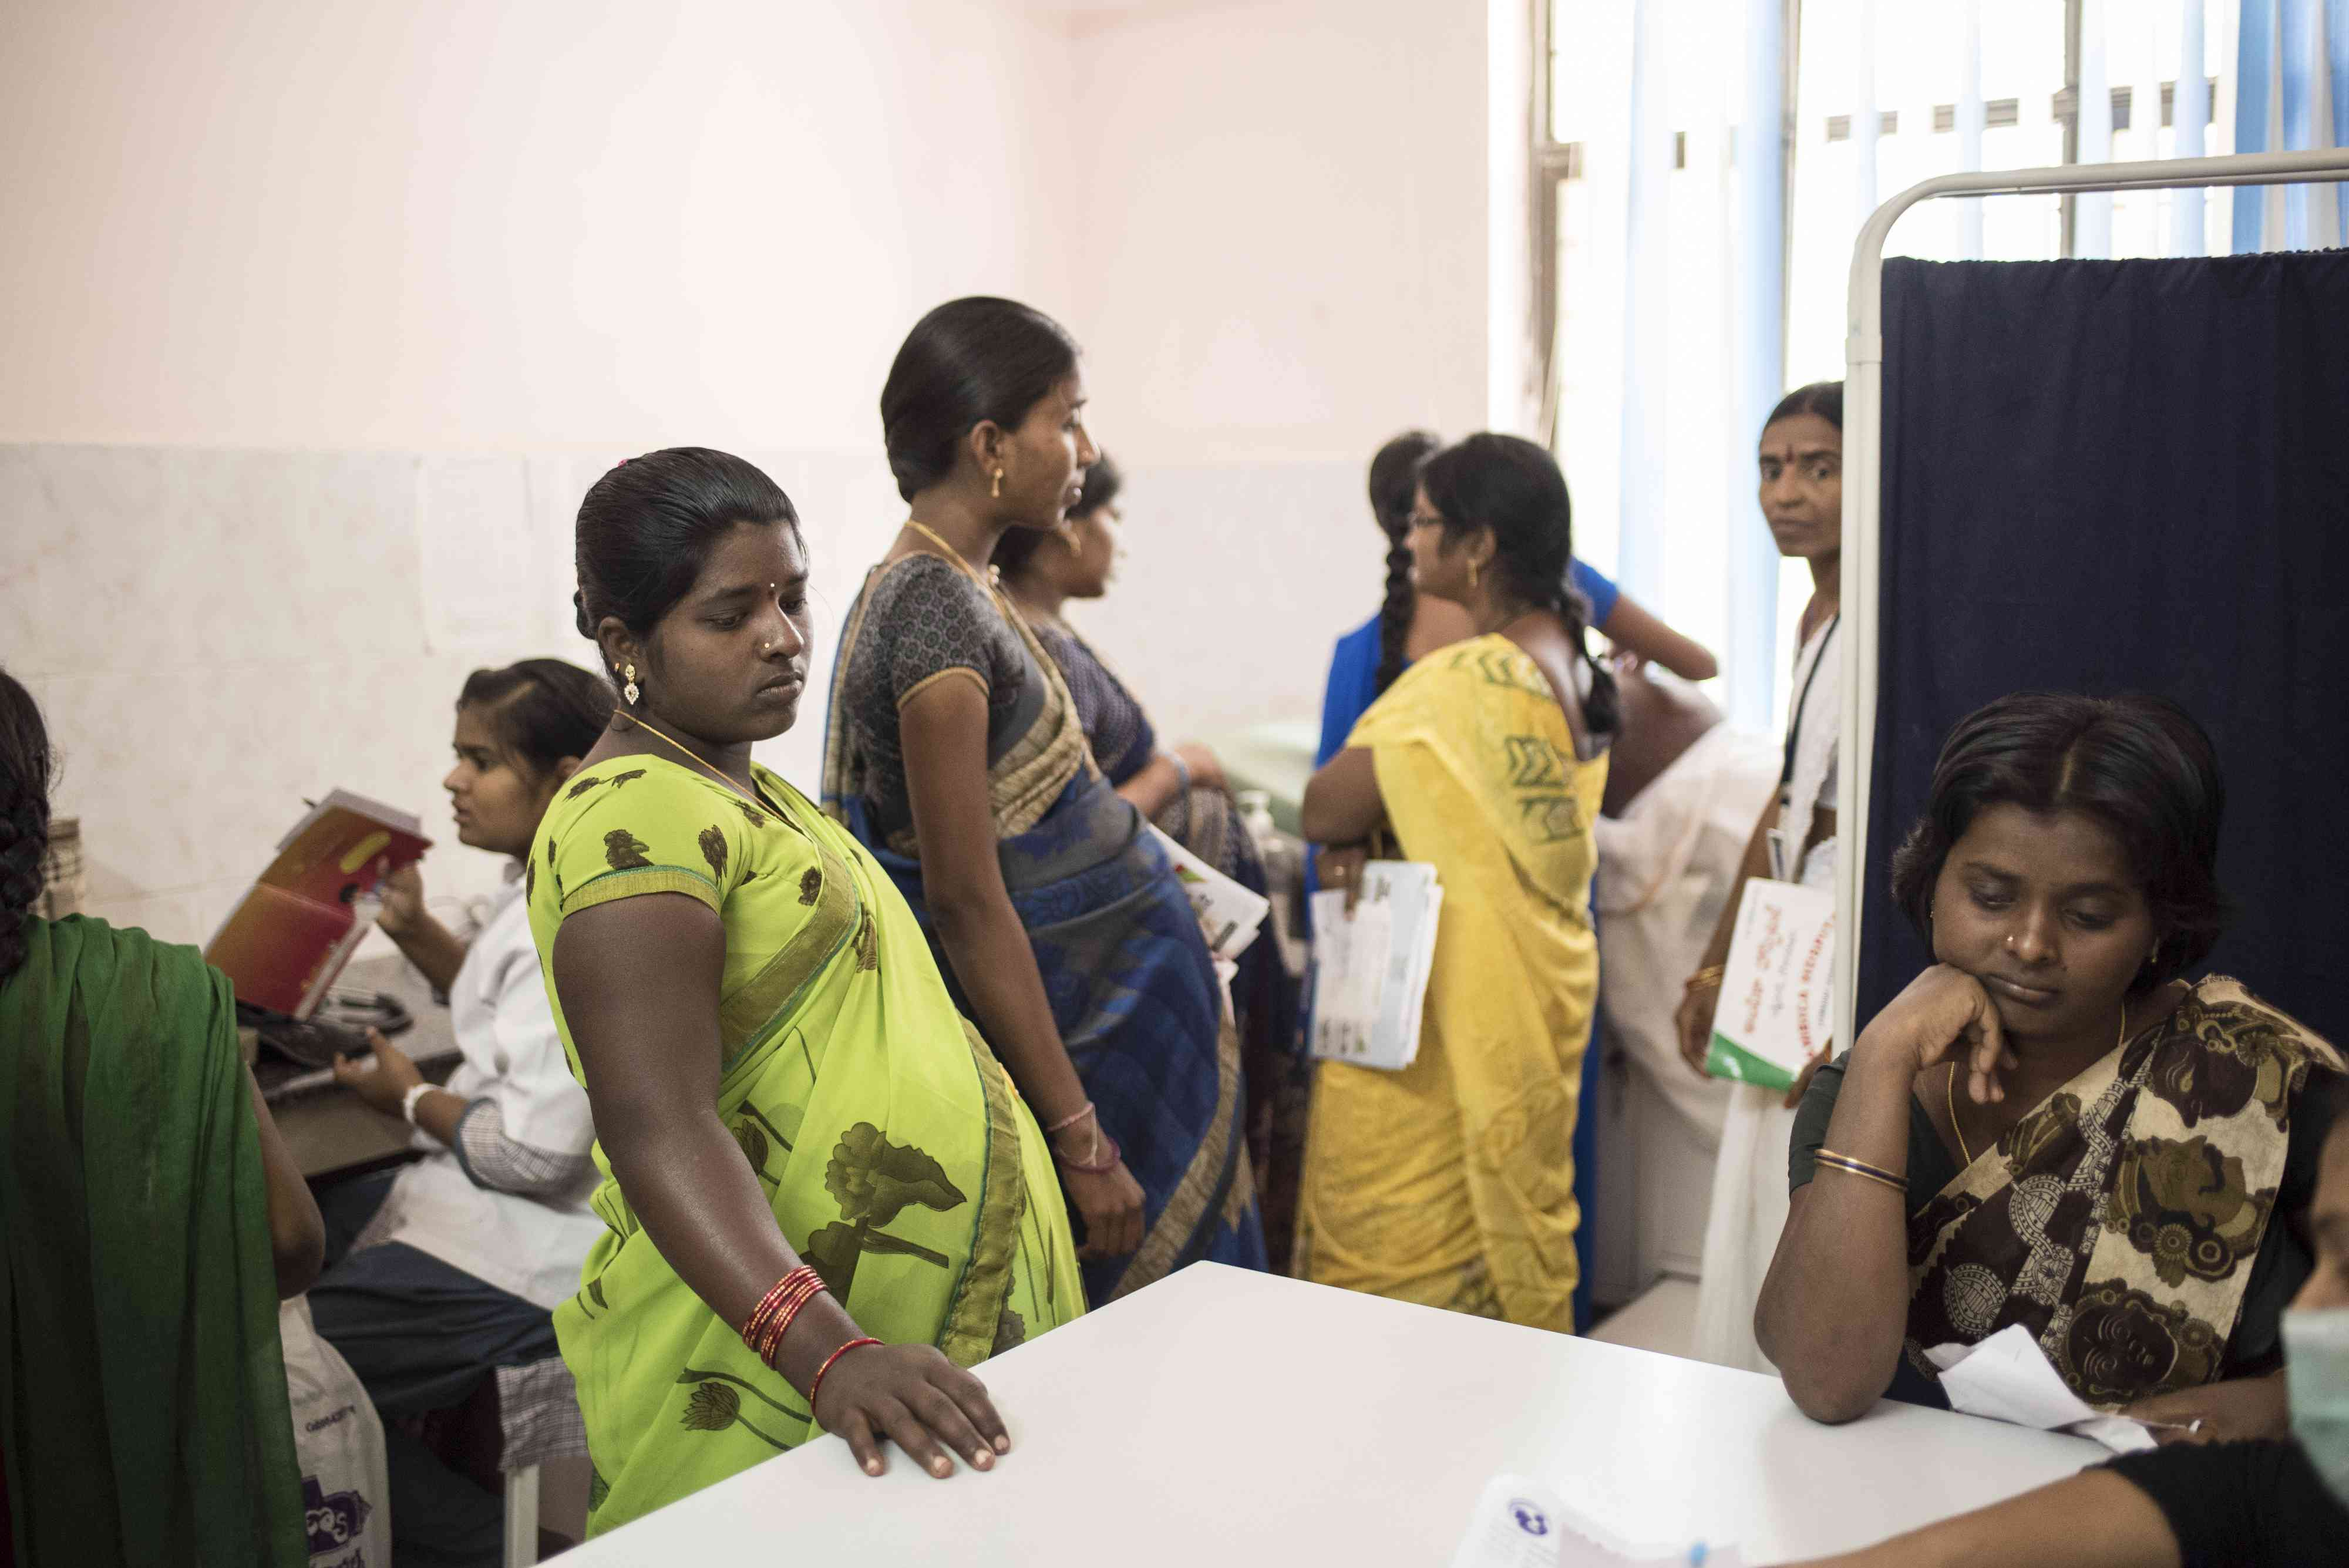 Women at the Mother and Child Health Centre in Karimnagar. (Photo: Saumya Khandelwal)